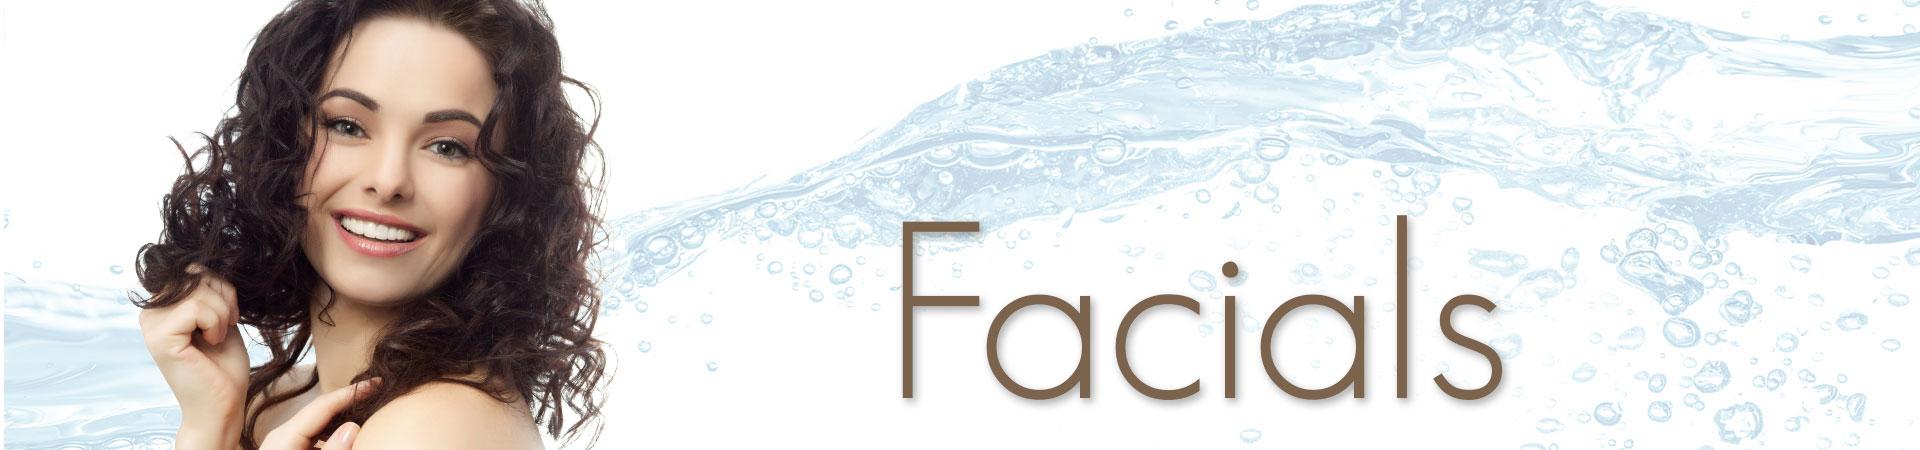 facials-bg